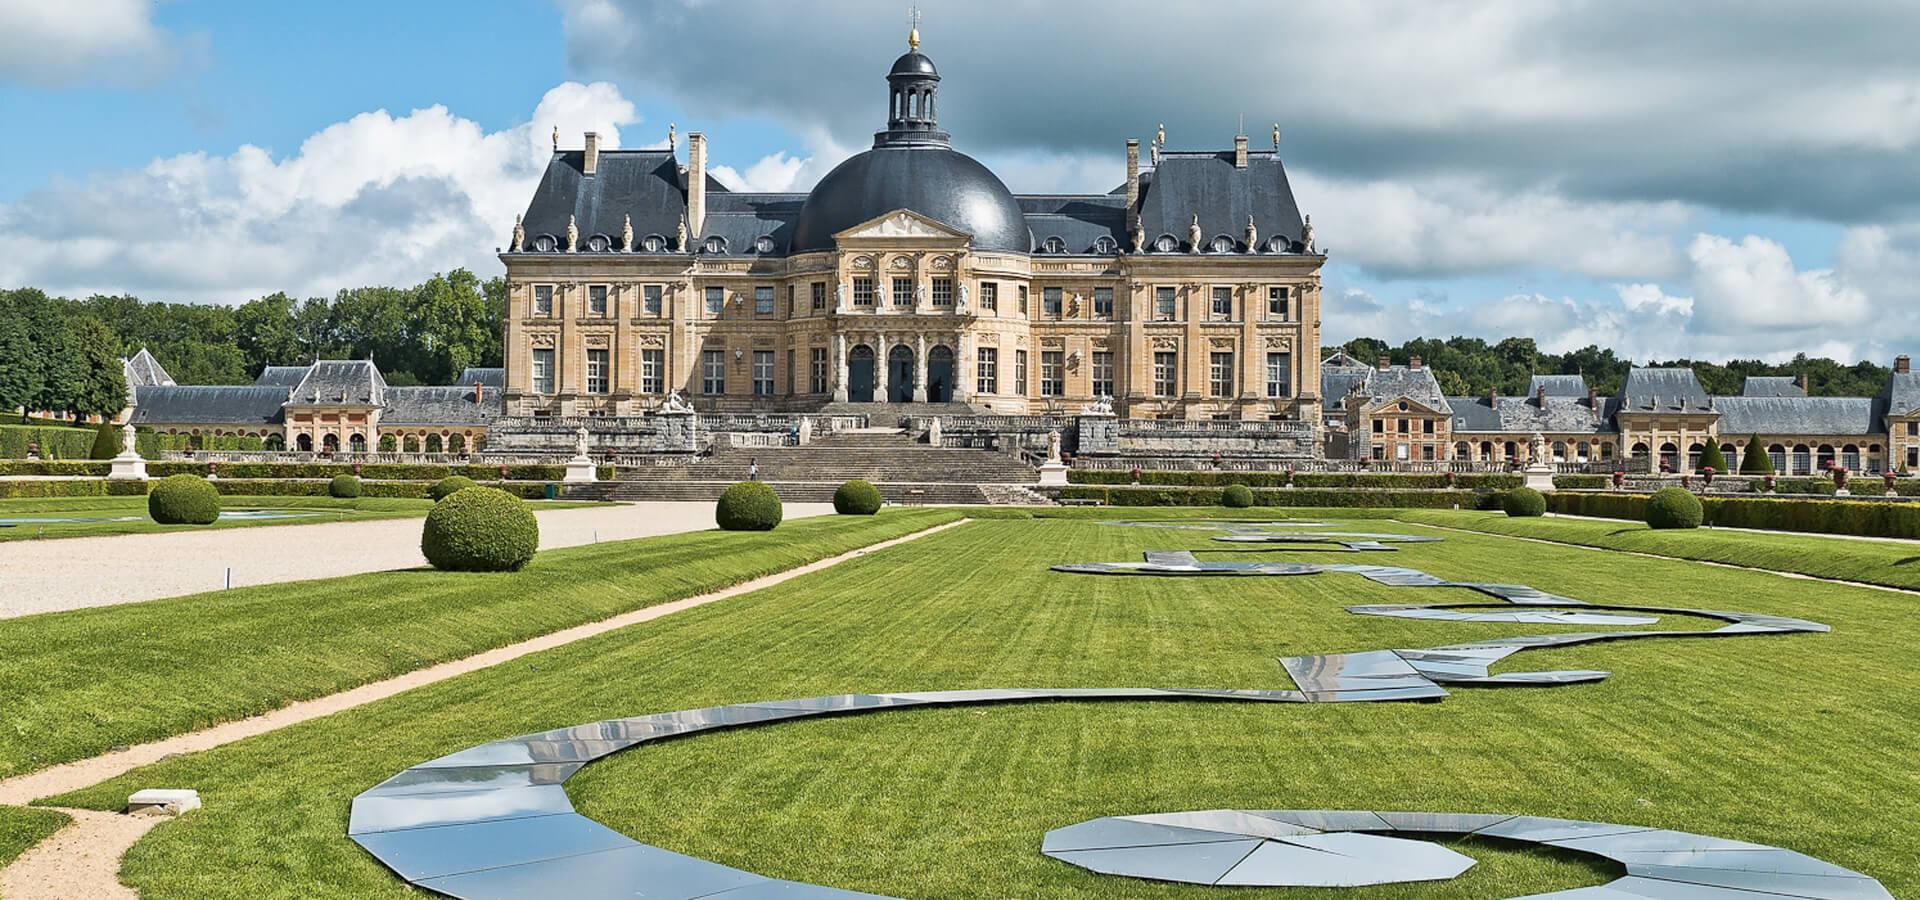 Por siempre, Vaux-le-Vicomte...